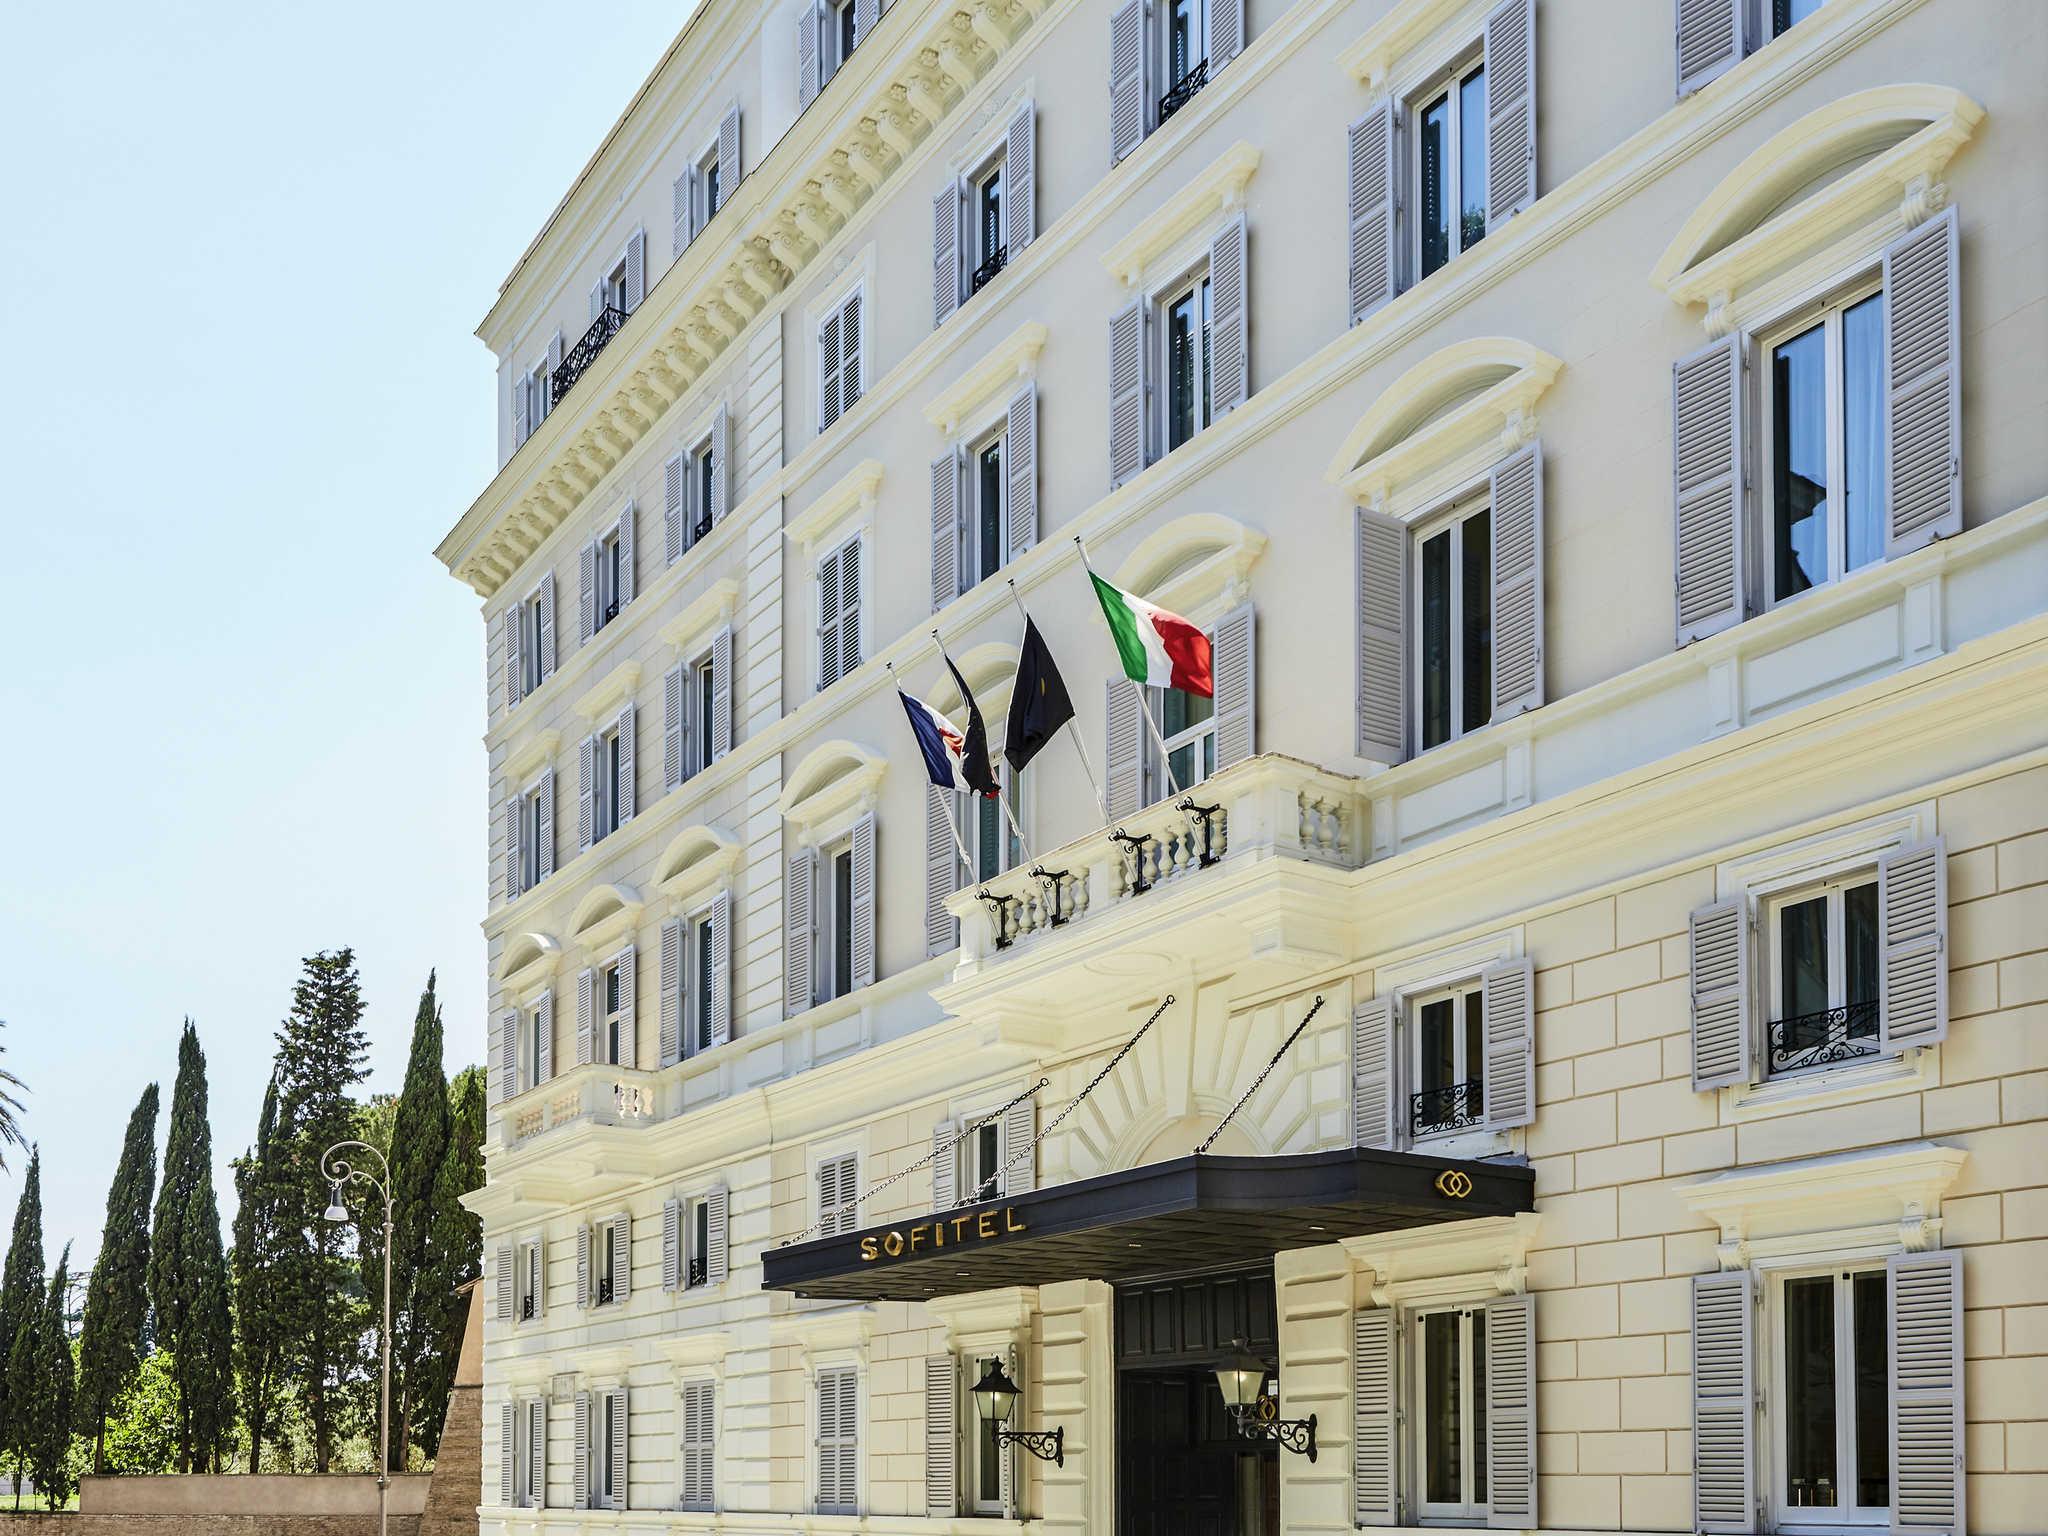 Hotel – Sofitel Rome (remodelação total